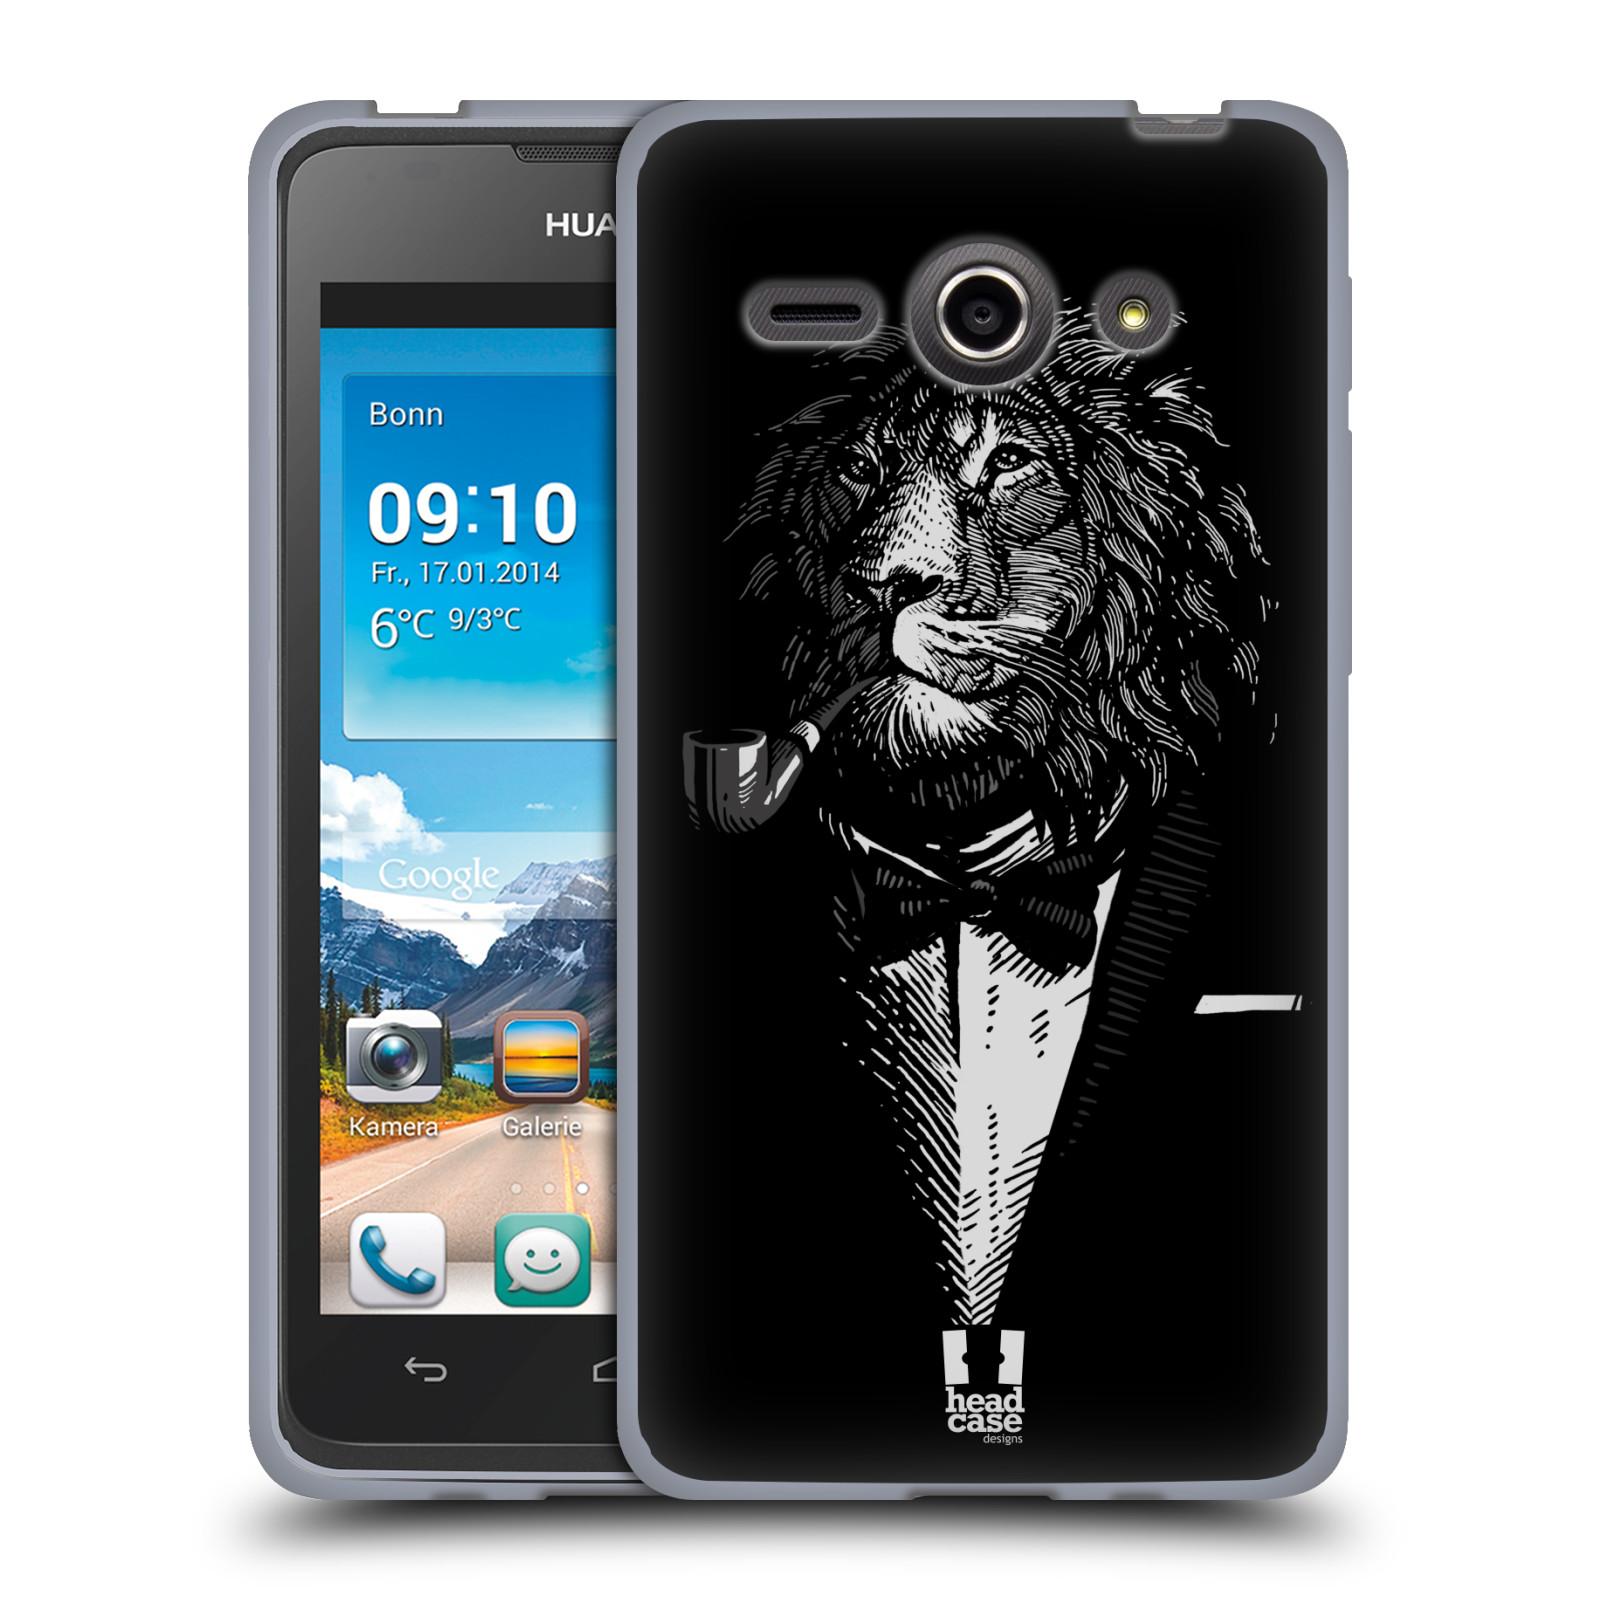 Silikonové pouzdro na mobil Huawei Ascend Y530 HEAD CASE LEV V KVÁDRU (Silikonový kryt či obal na mobilní telefon Huawei Ascend Y530)